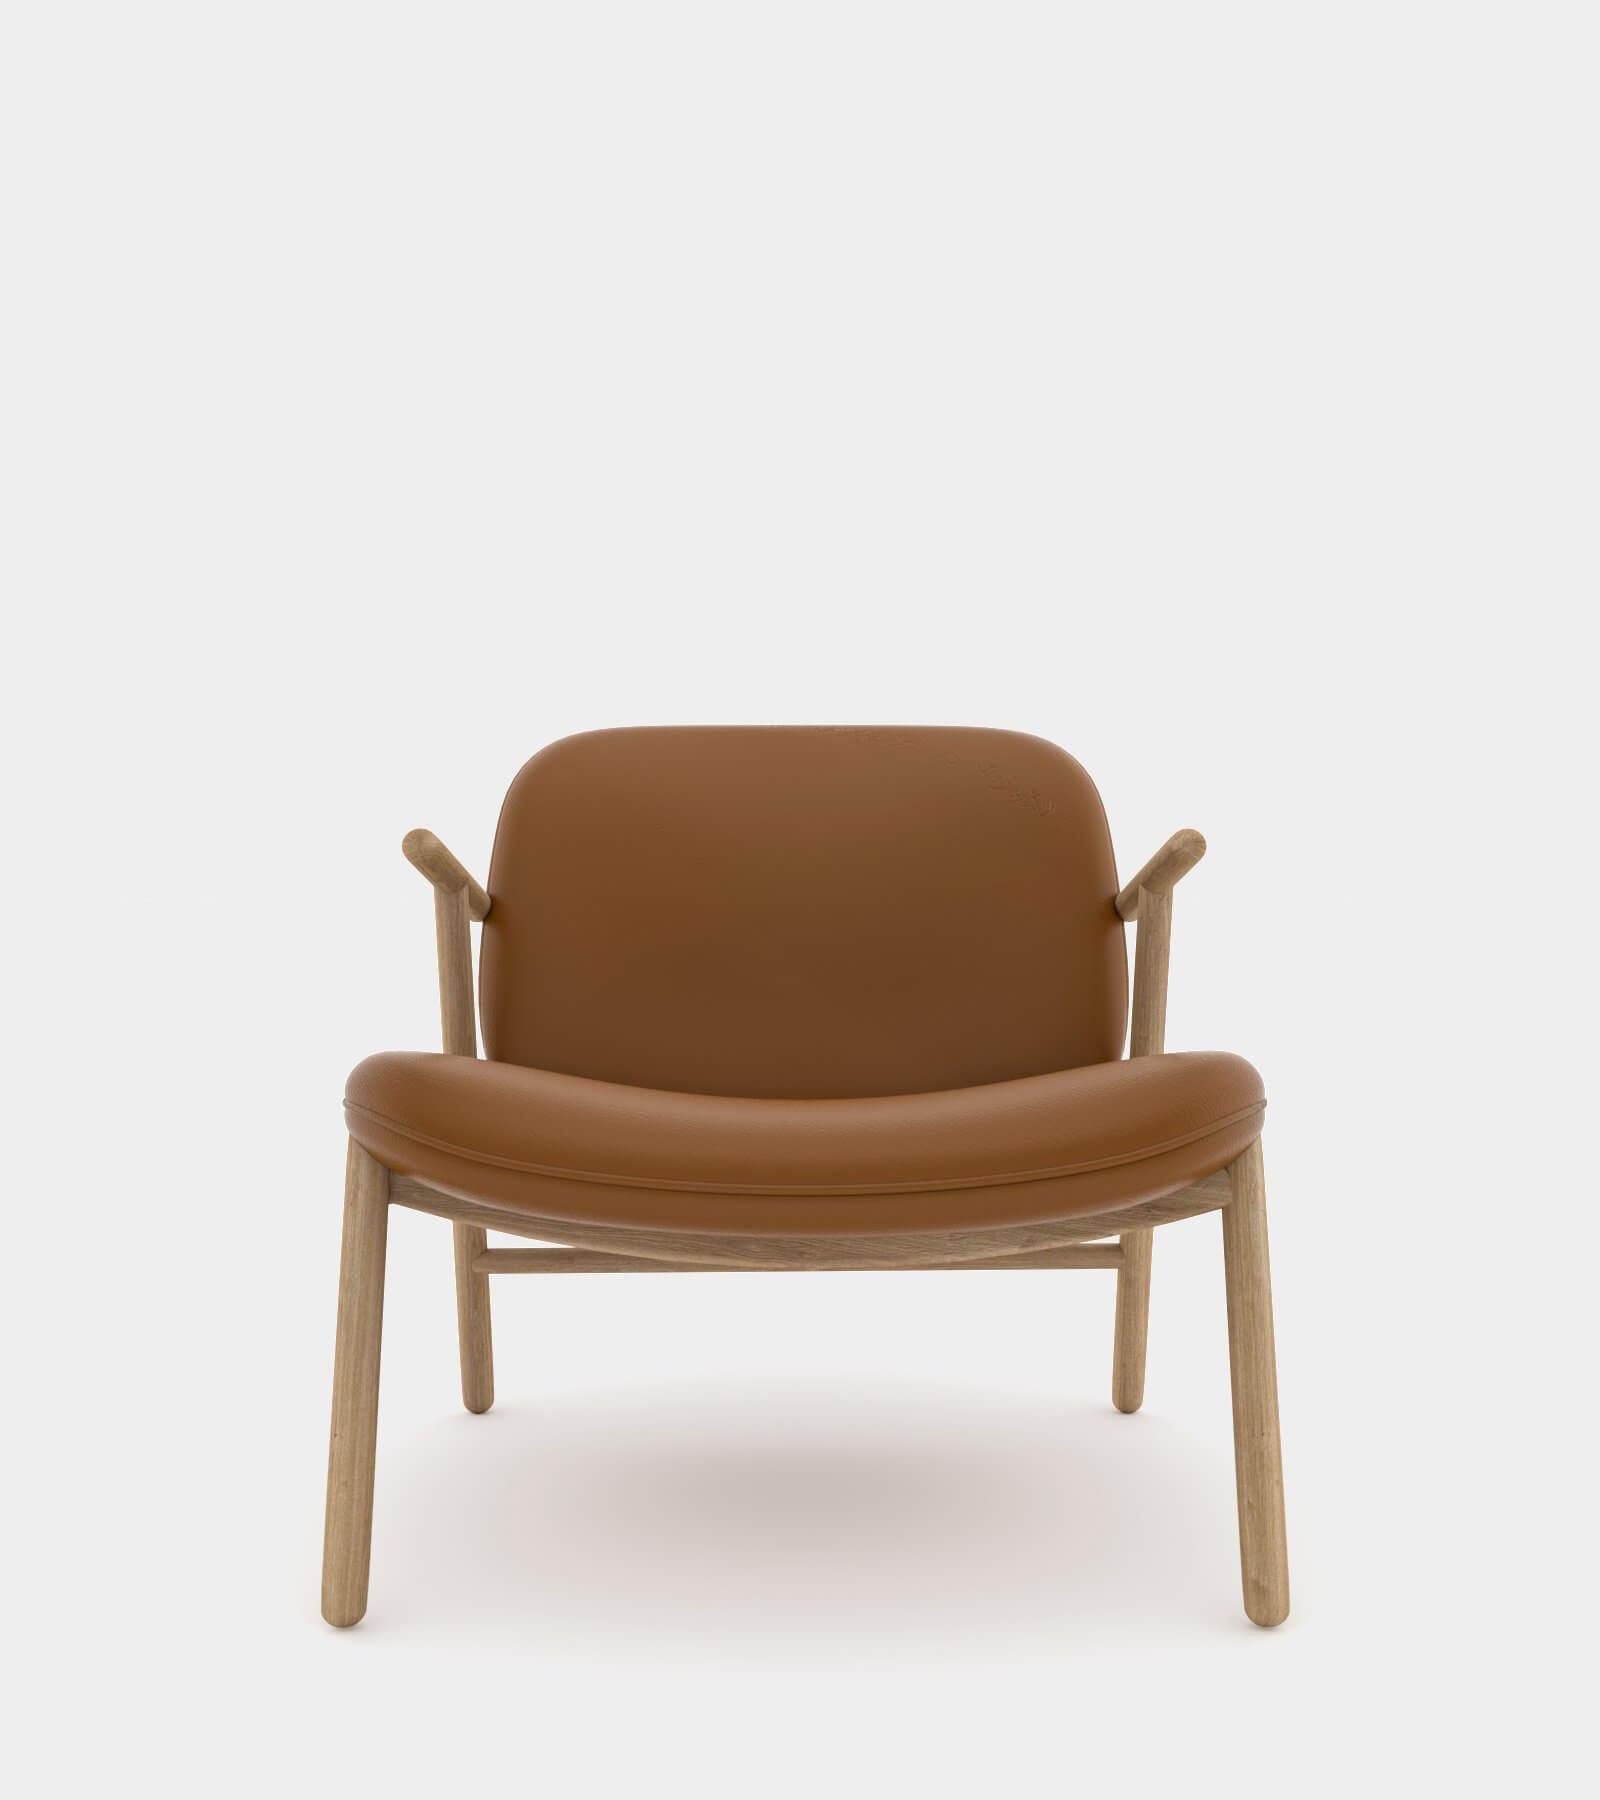 Cozy lounge chair-2 3D Model